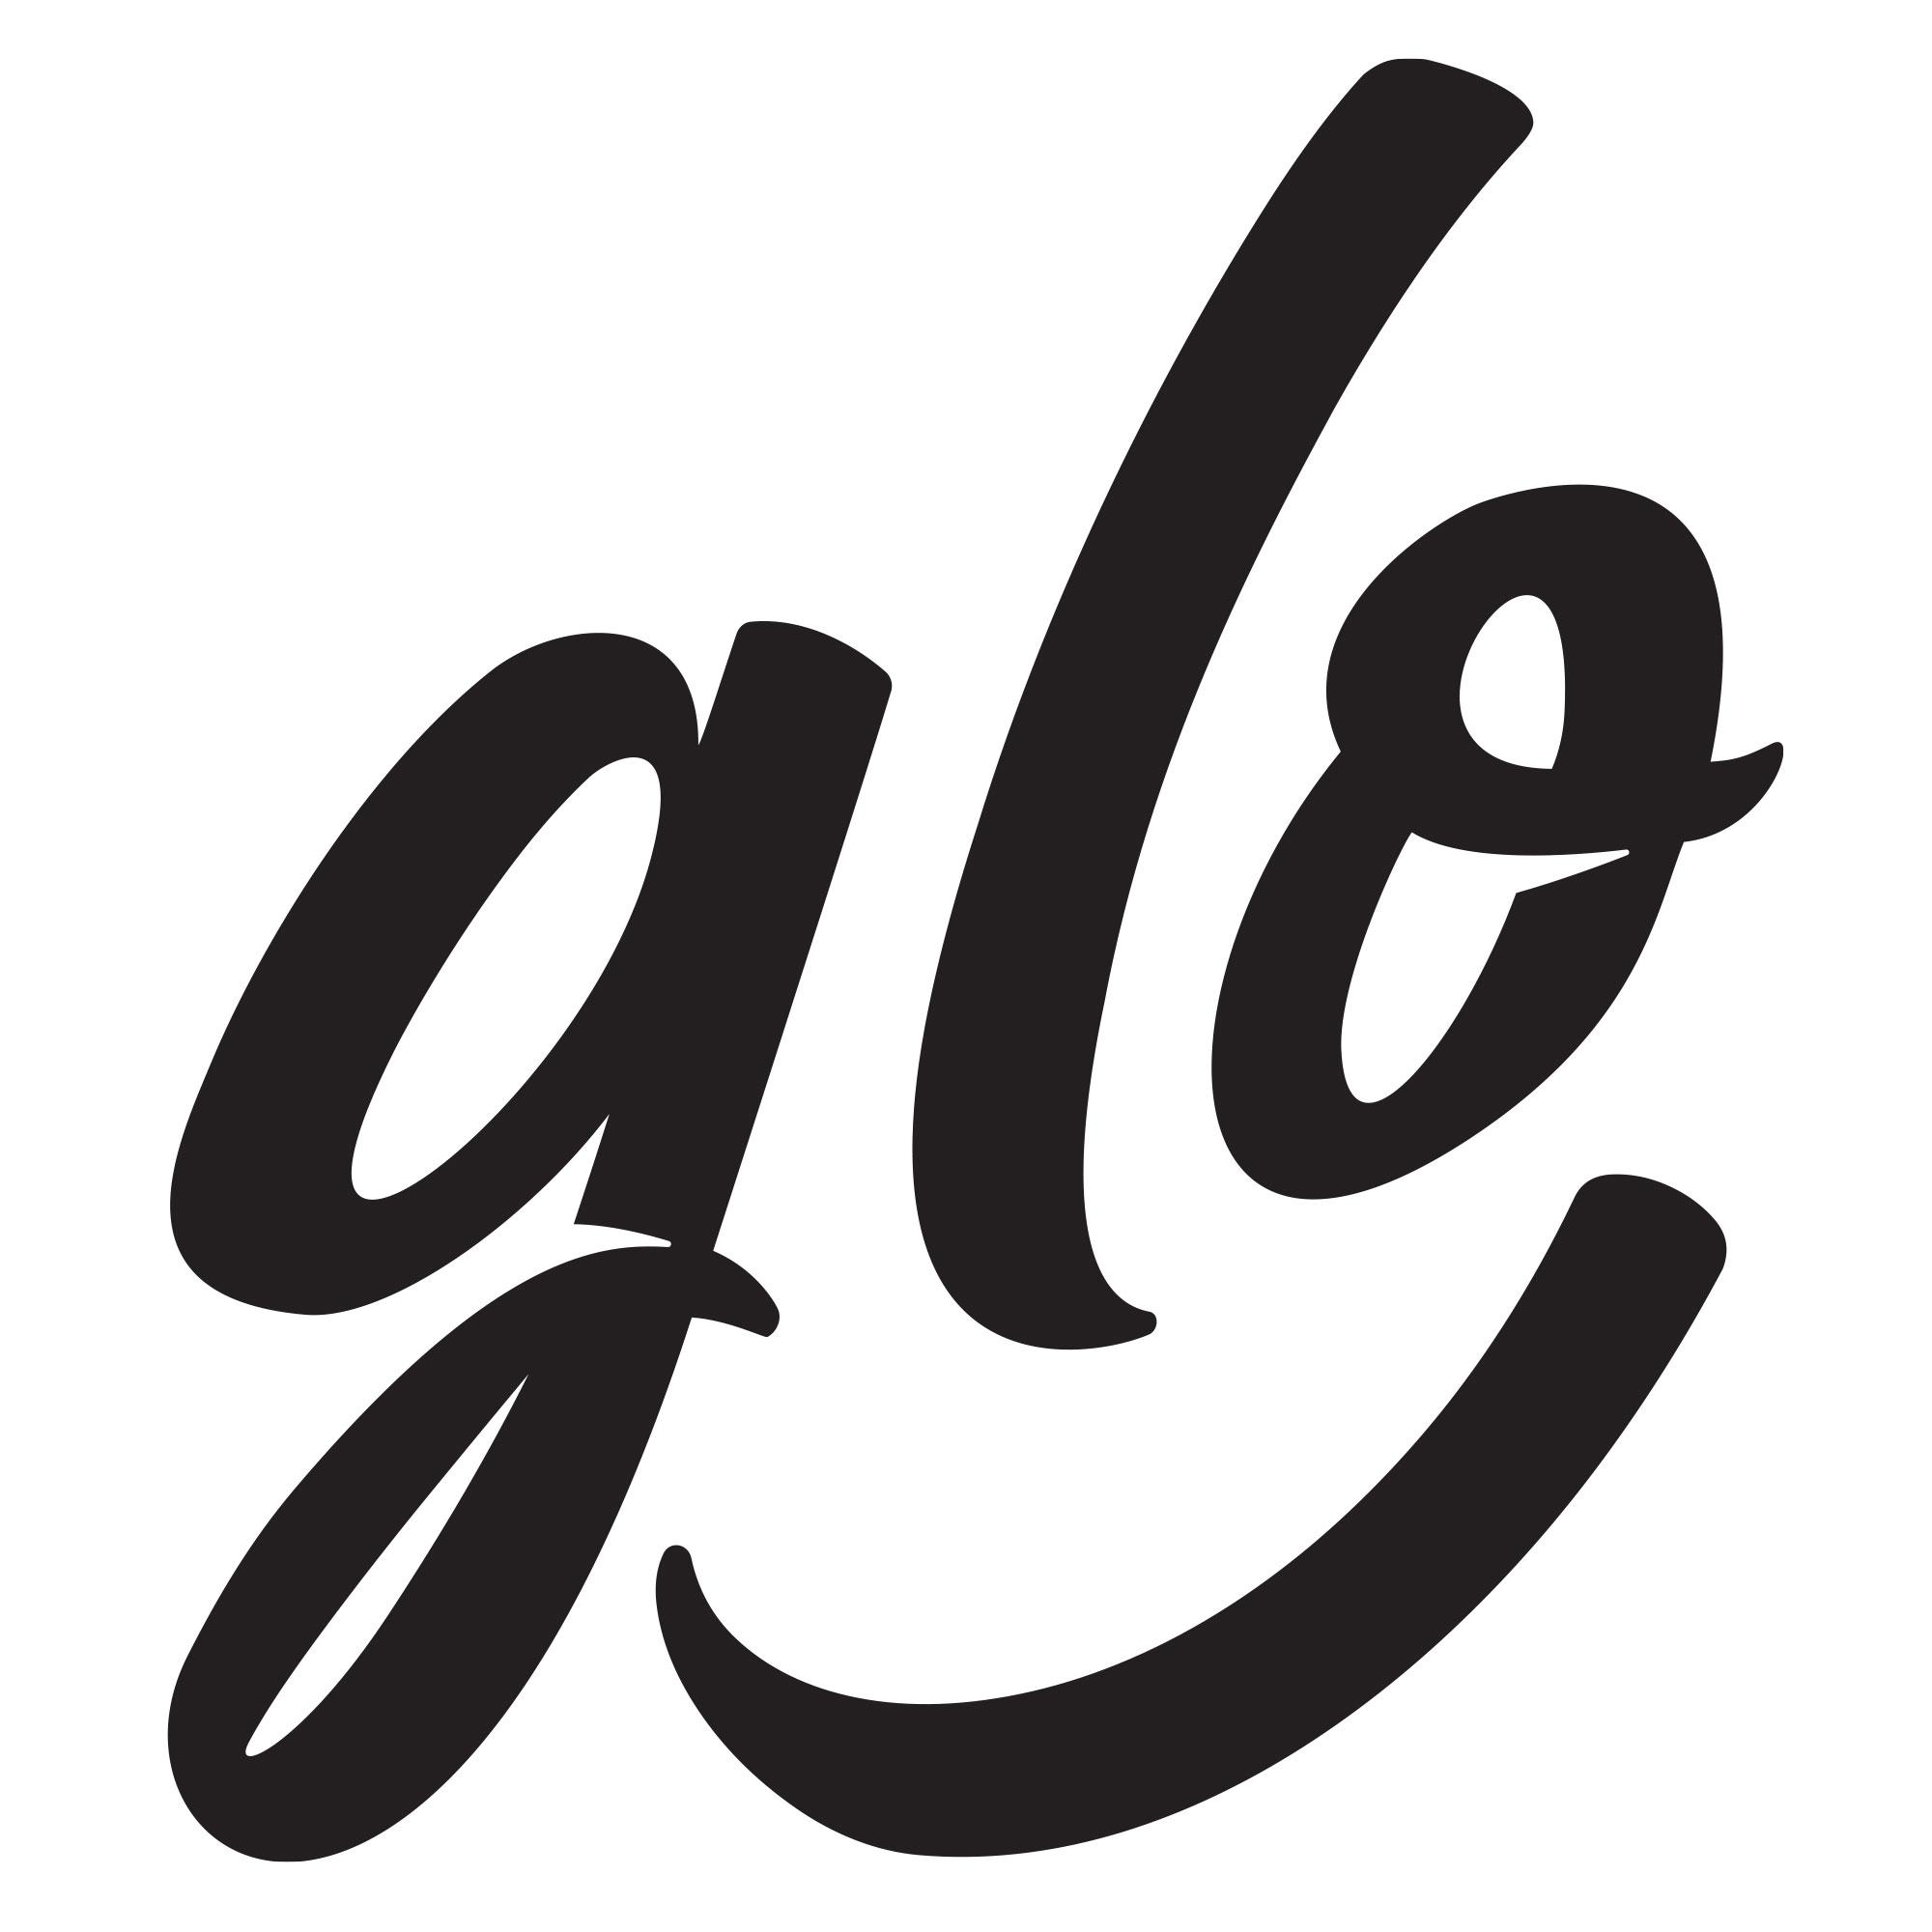 Glo-Logo-BLACK.jpg (124 KB)